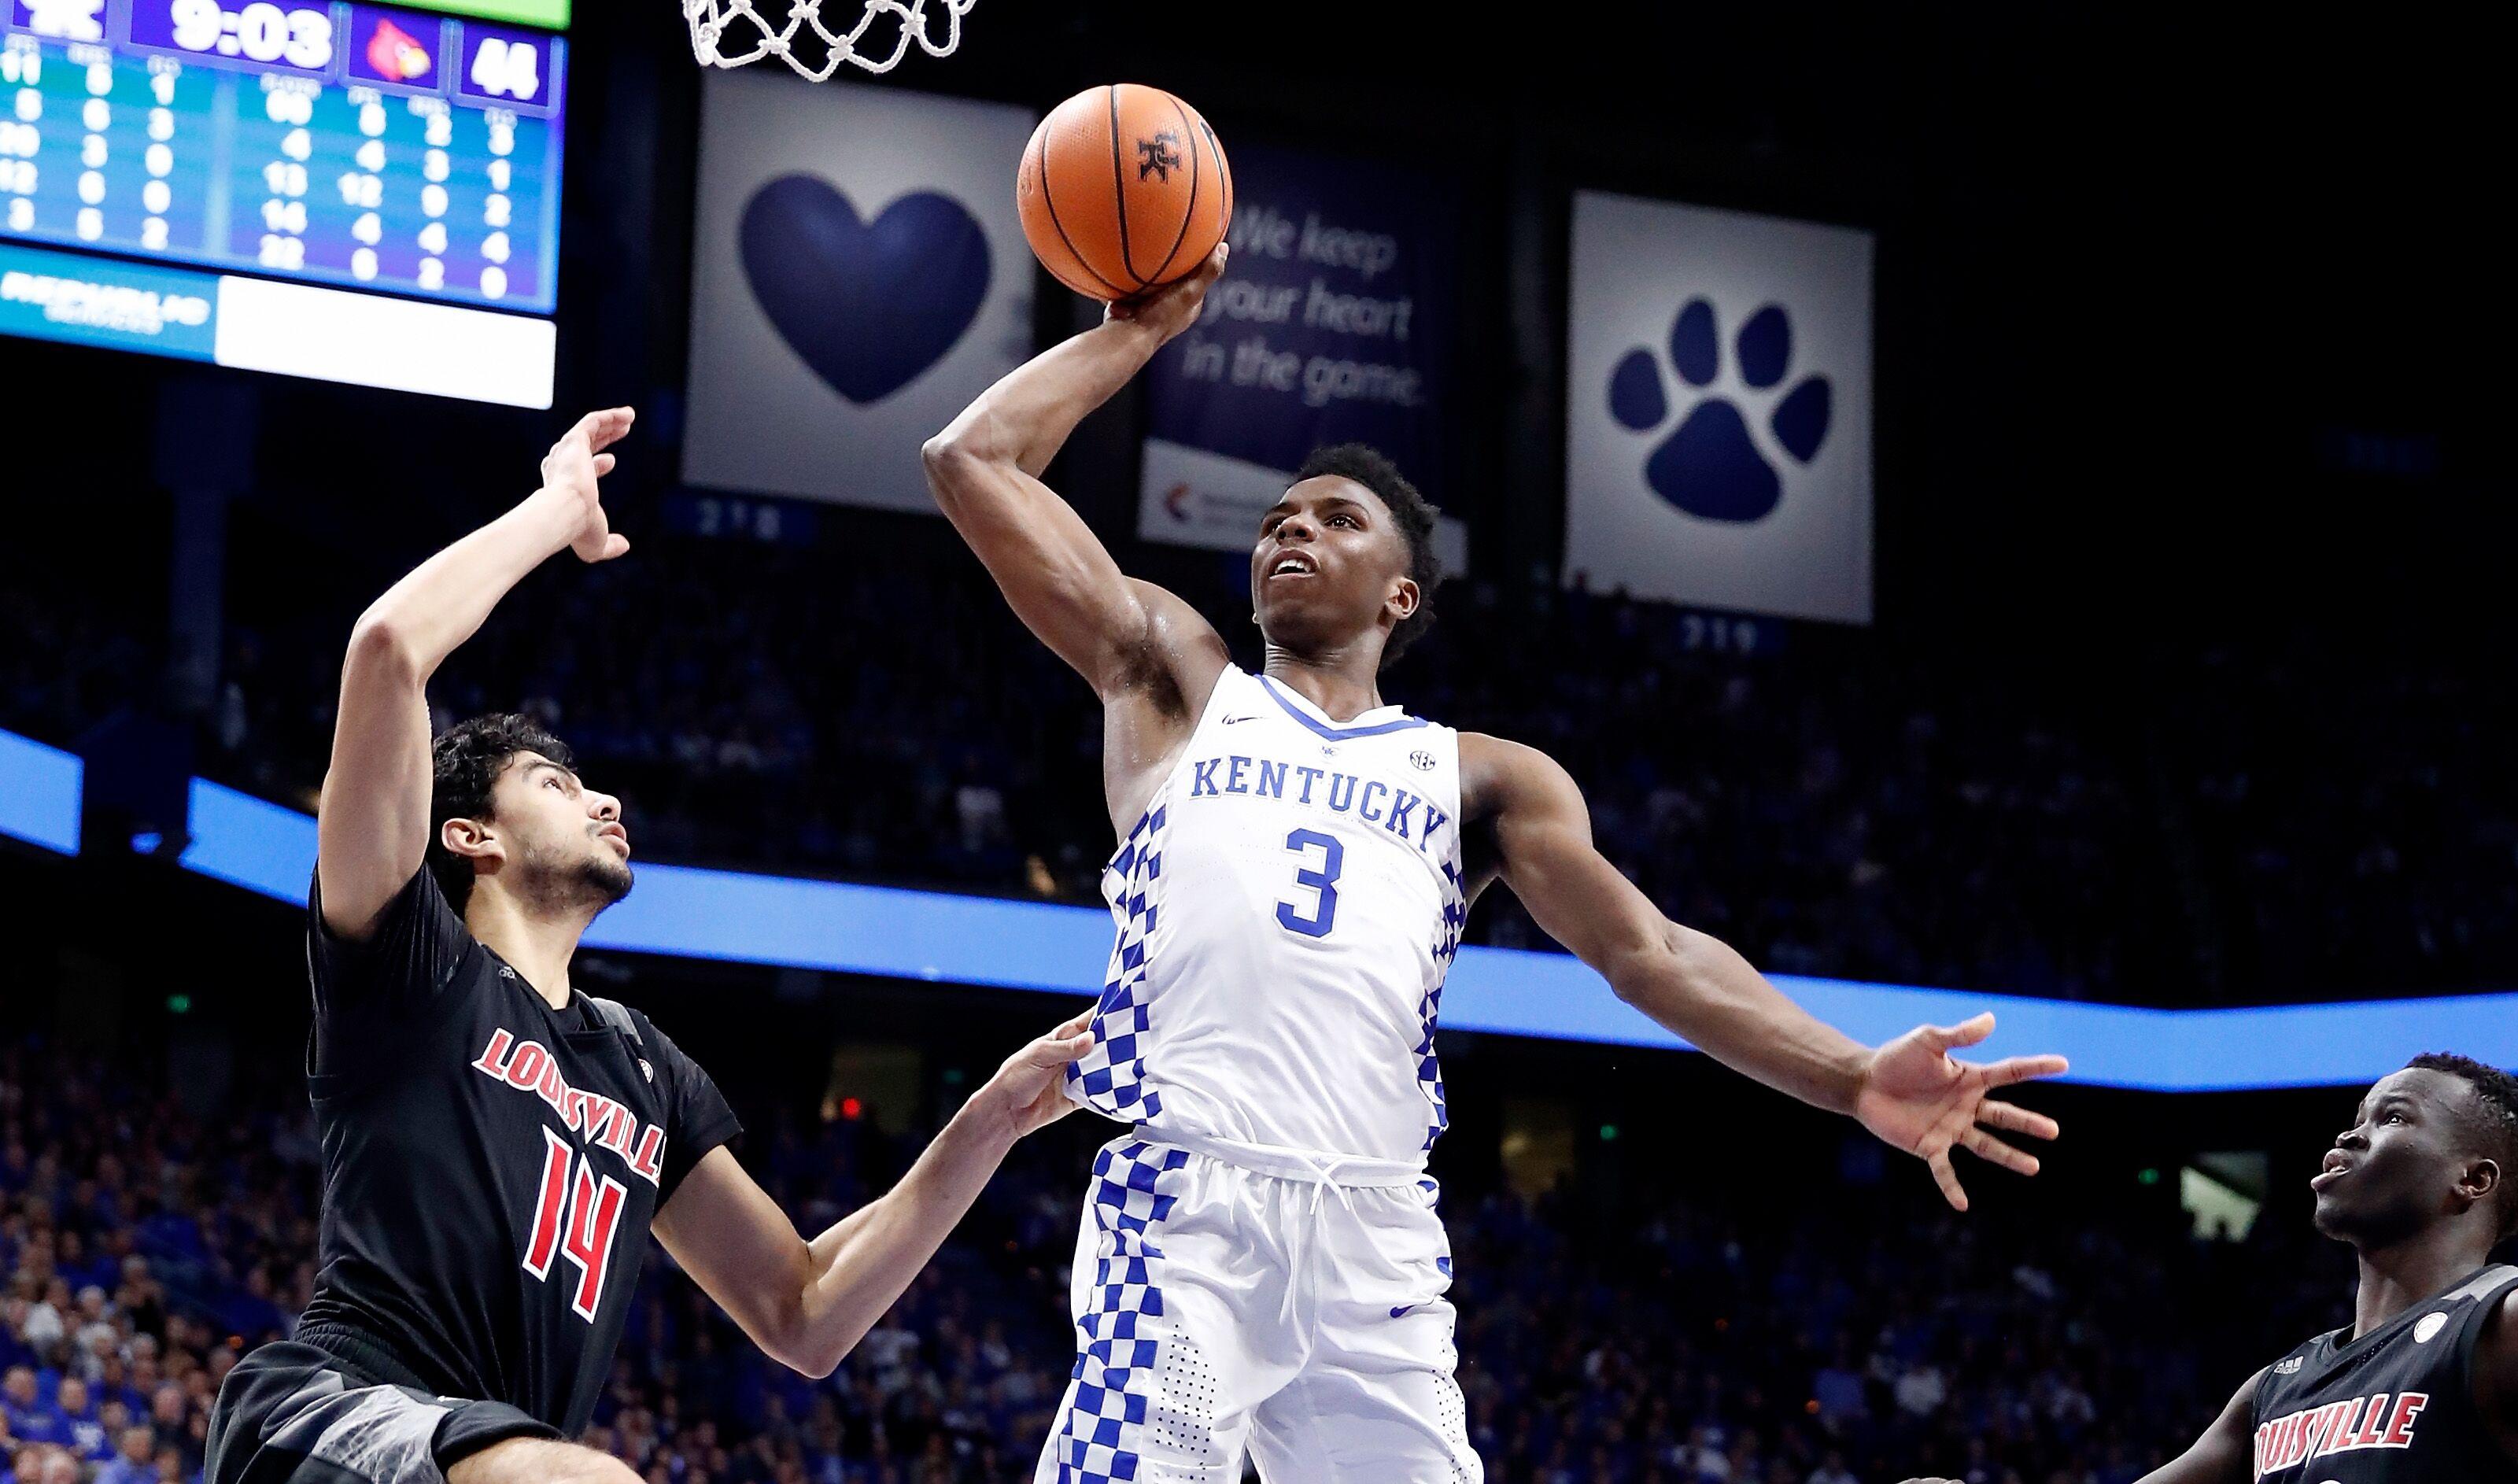 Uk Basketball: Kentucky Wildcats Vs Georgia Bulldogs: 3 Keys, TV/radio